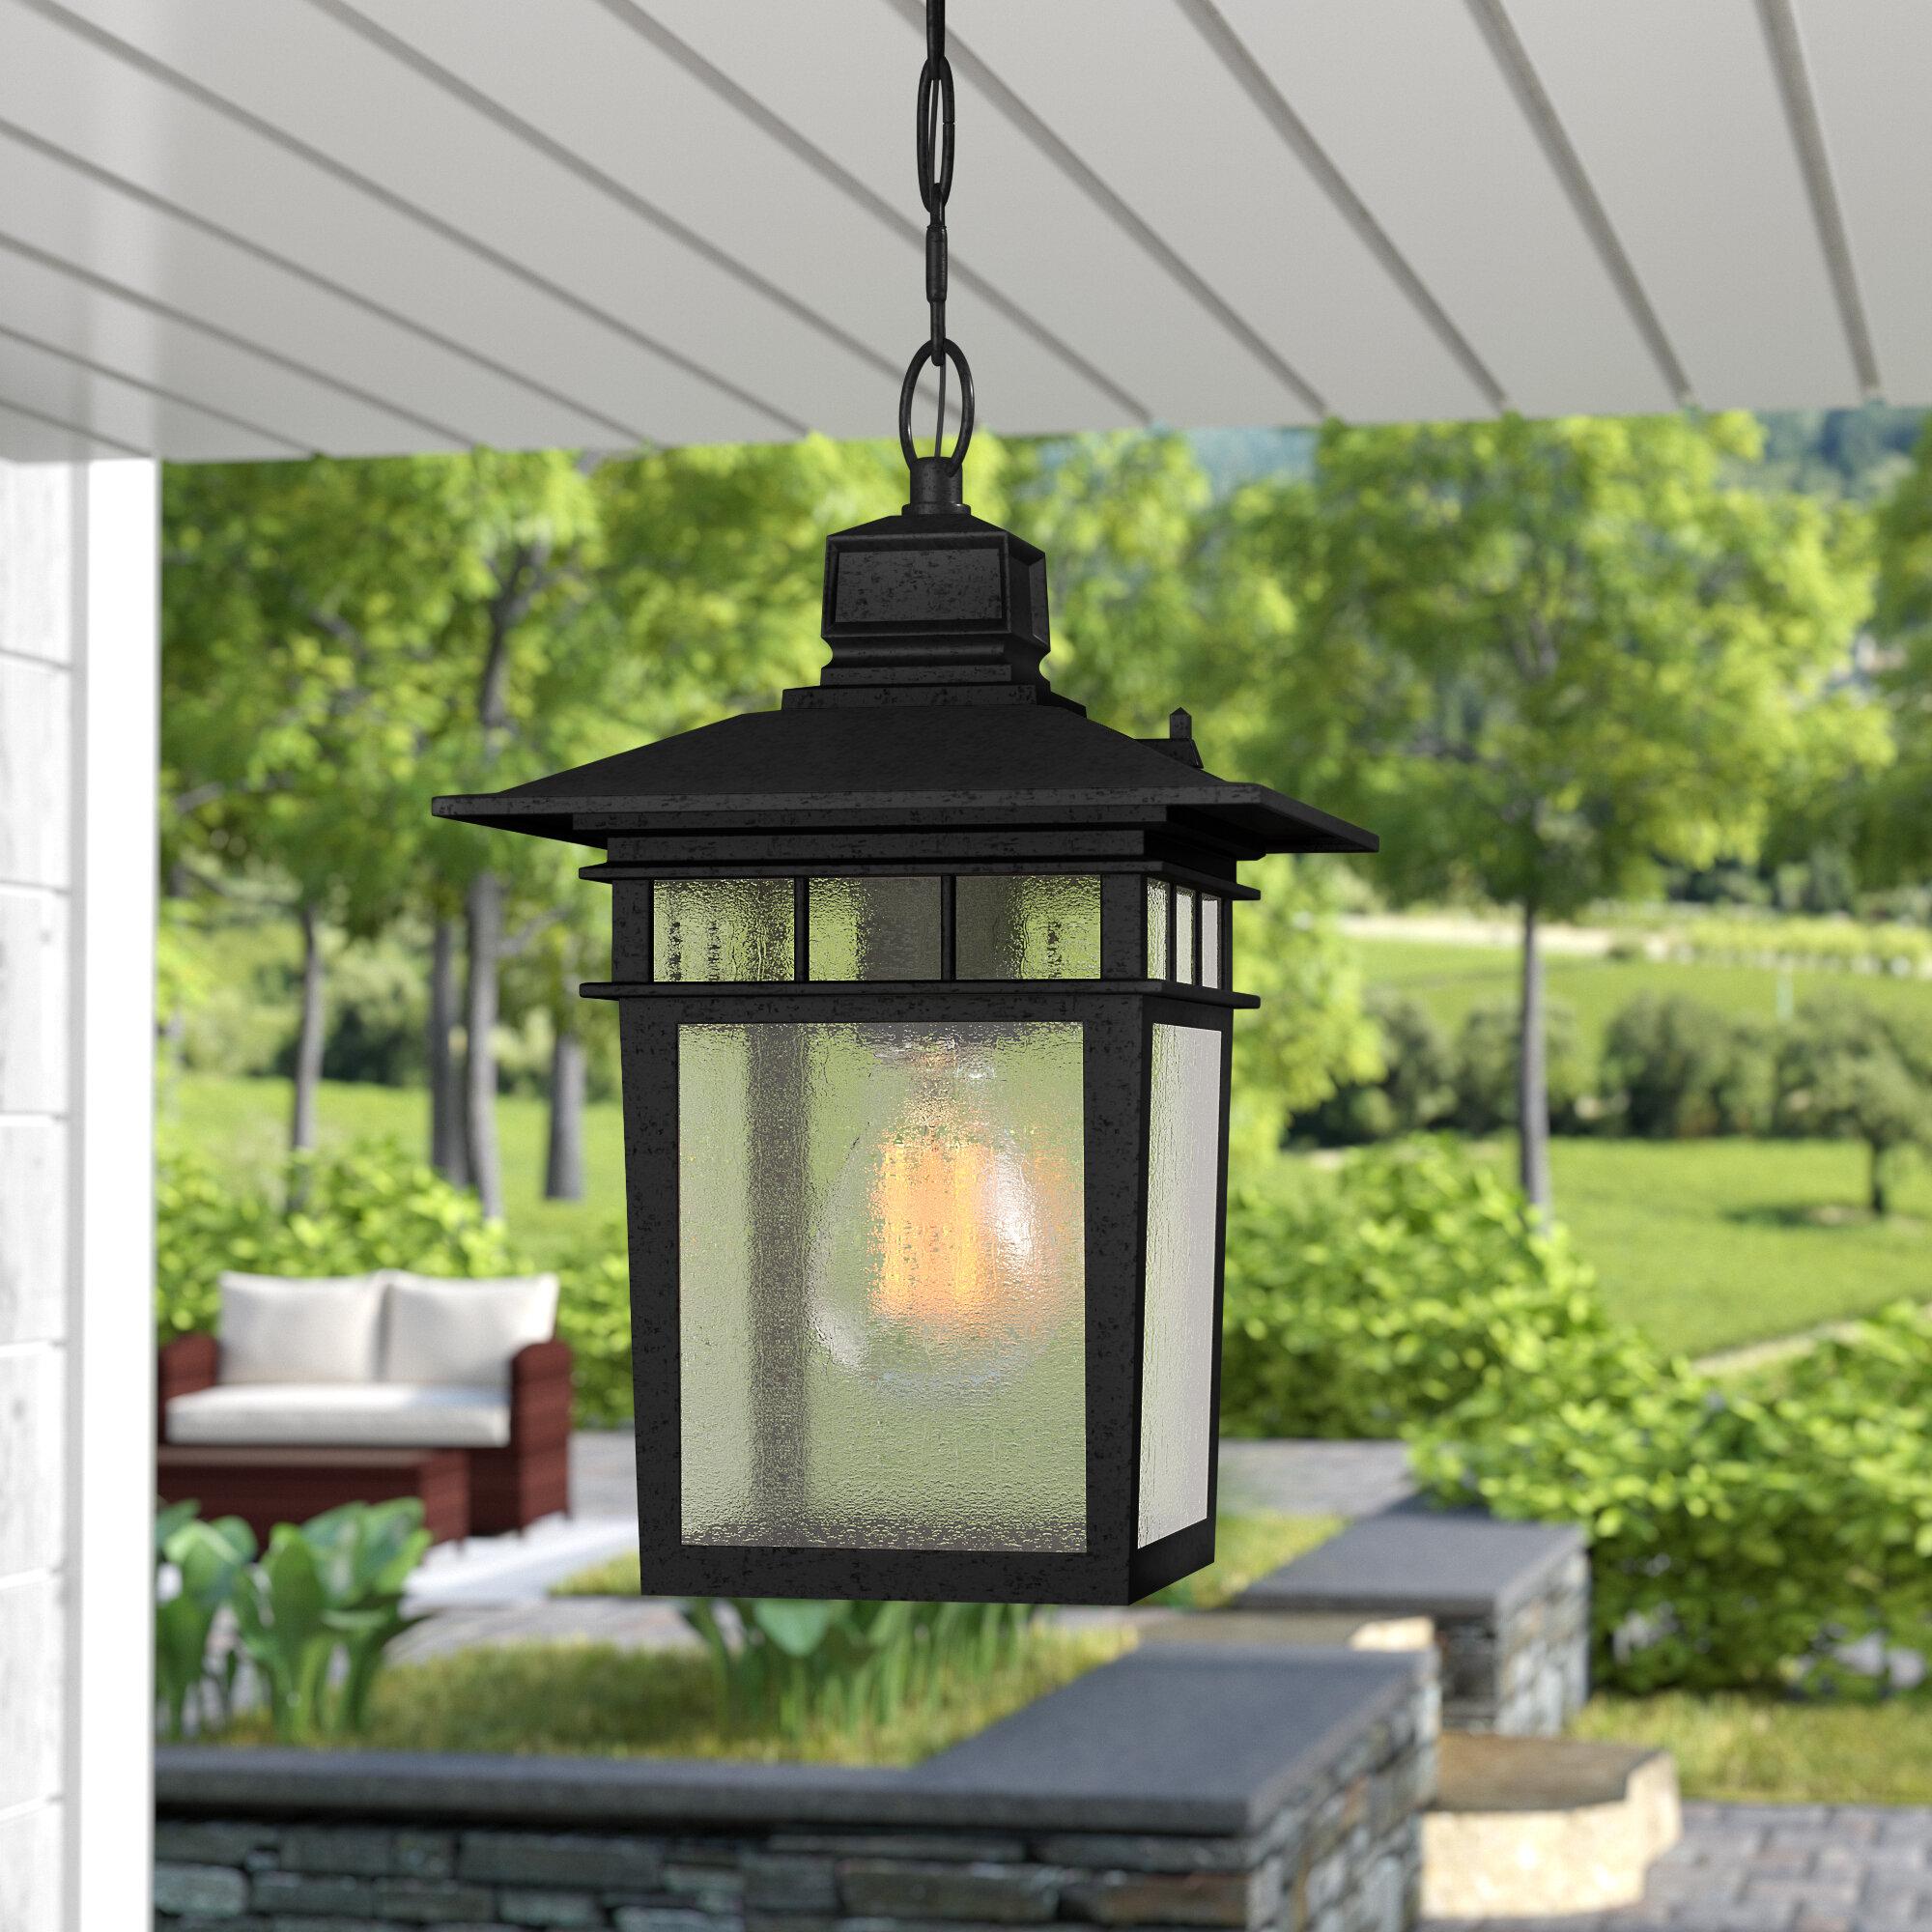 Beachcrest Home Valeri 1 Light Outdoor Hanging Lantern Reviews Wayfair